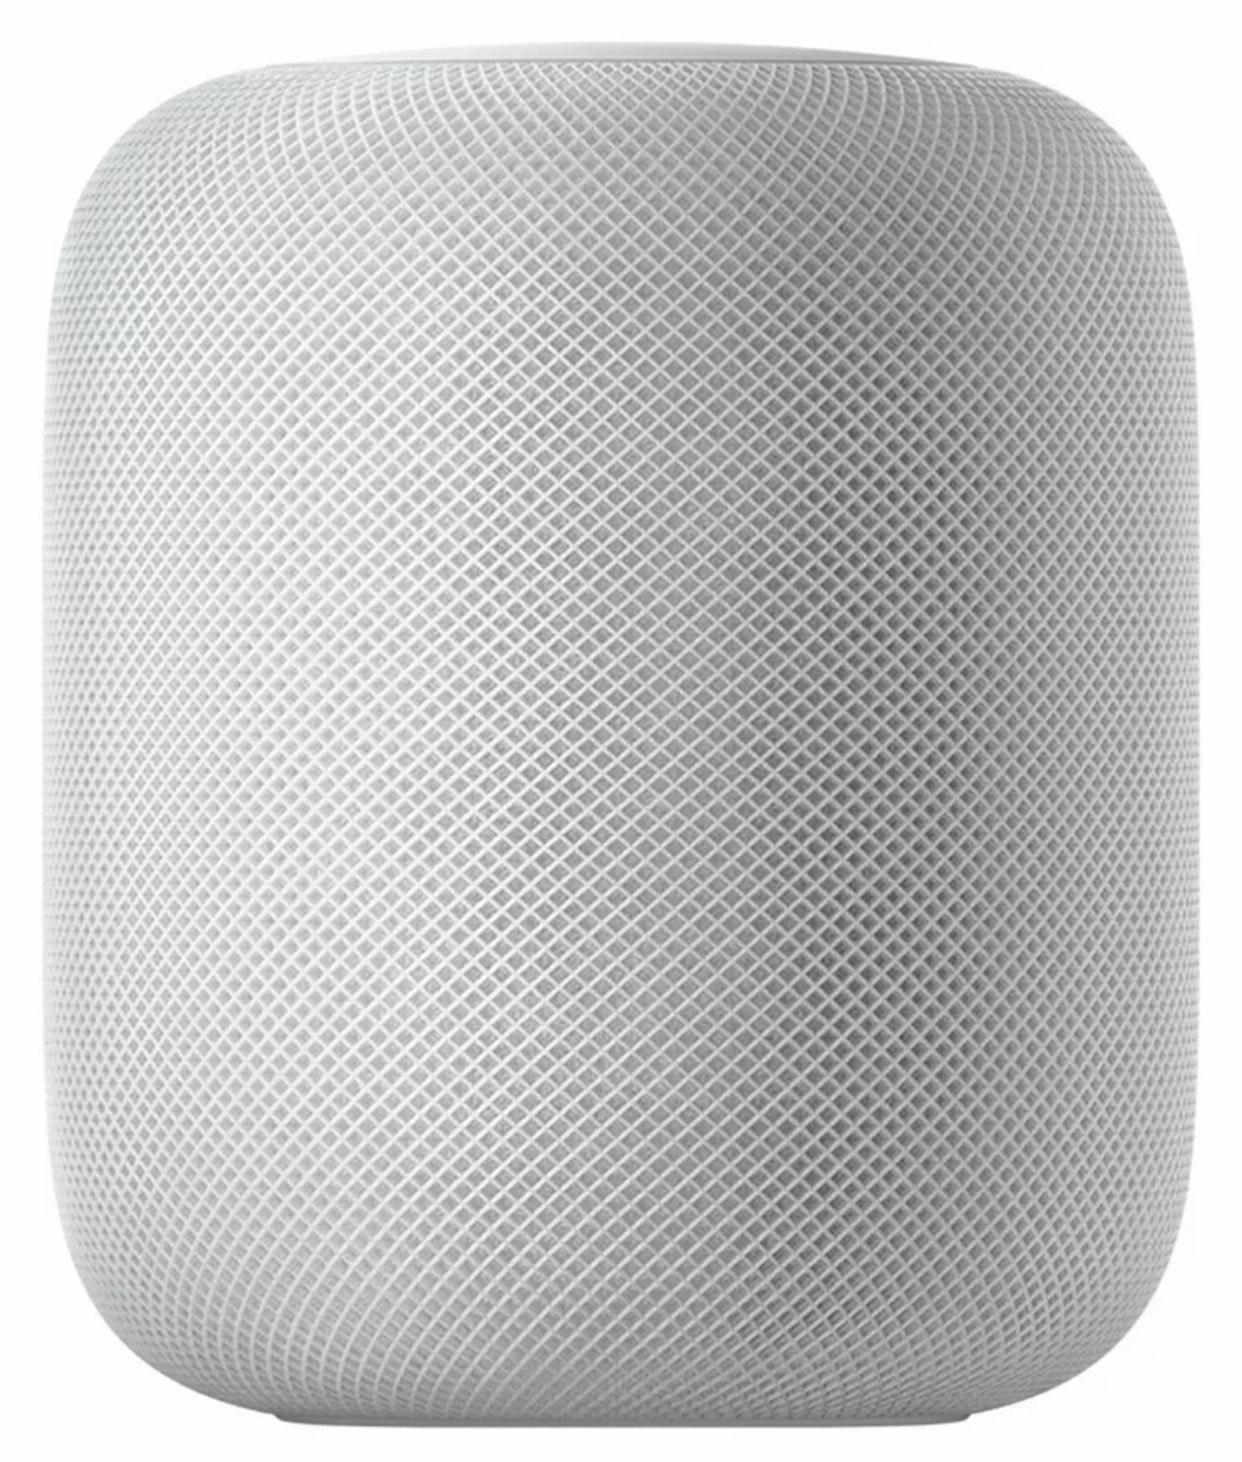 Apple HomePod Wireless Speaker - White Refurbished £265.05 @ Argos / eBay